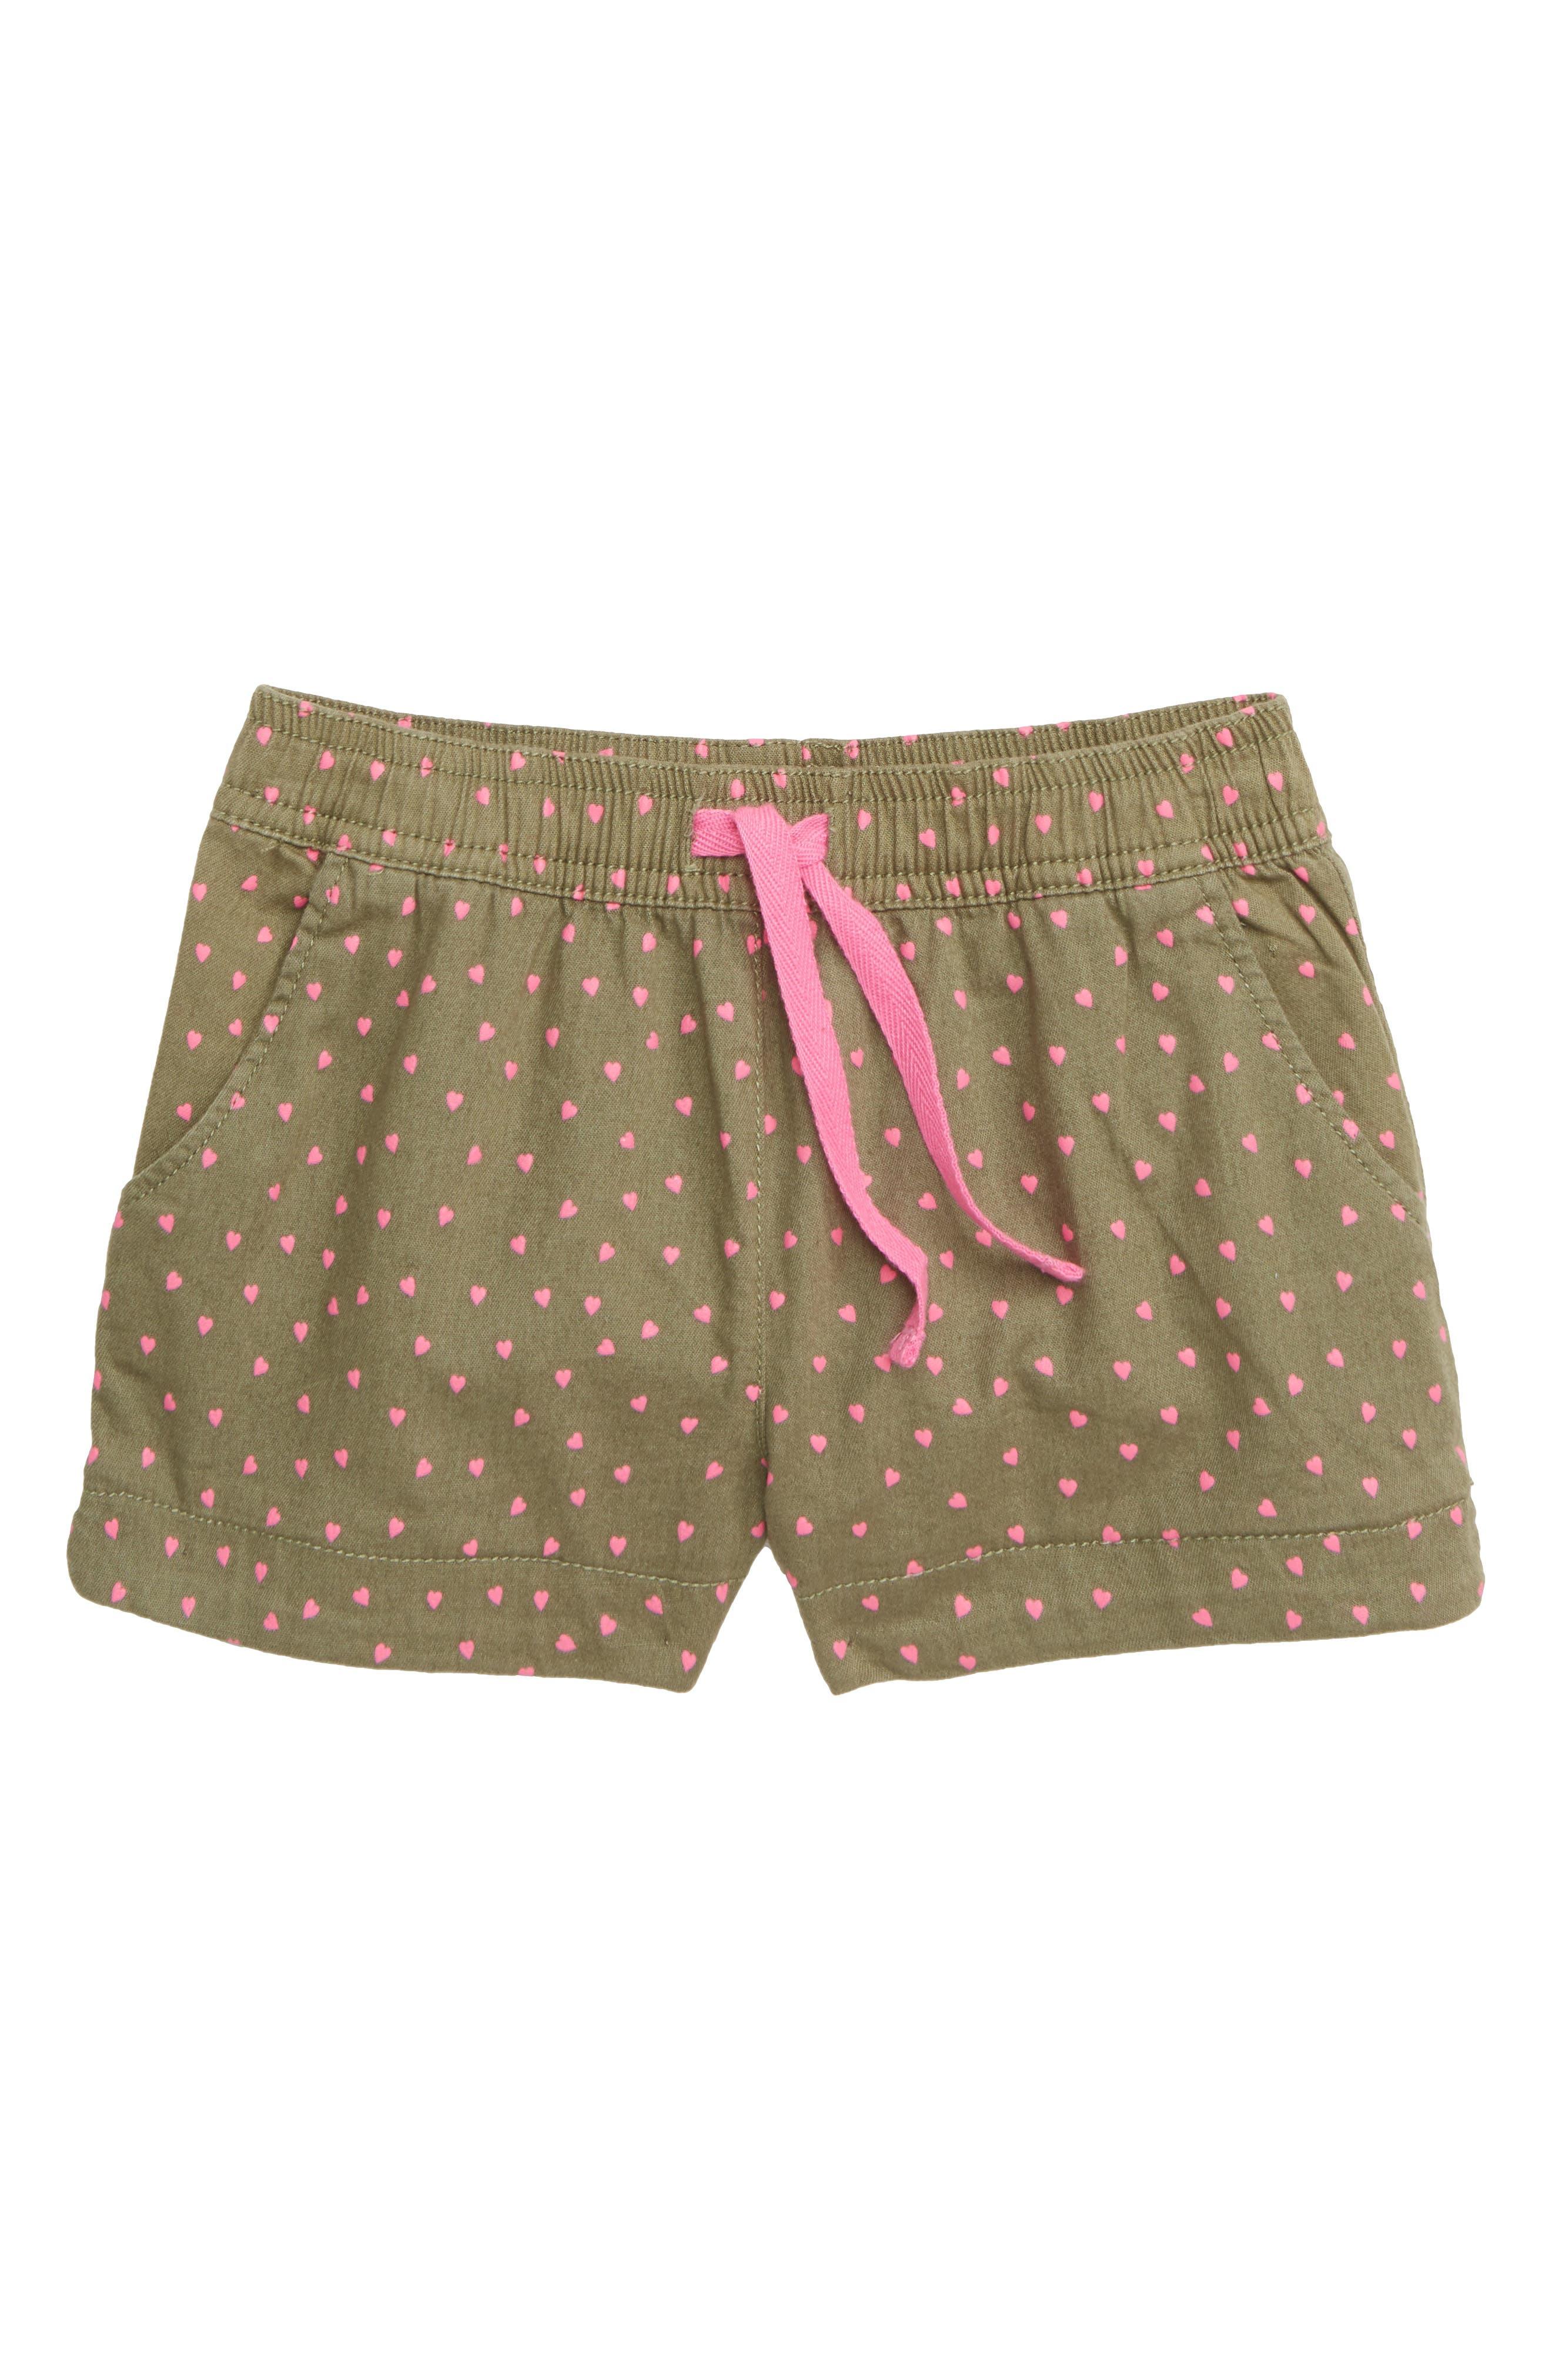 MINI BODEN, Heart Pocket Shorts, Main thumbnail 1, color, GRN ARMY GREEN SWEET HEARTS